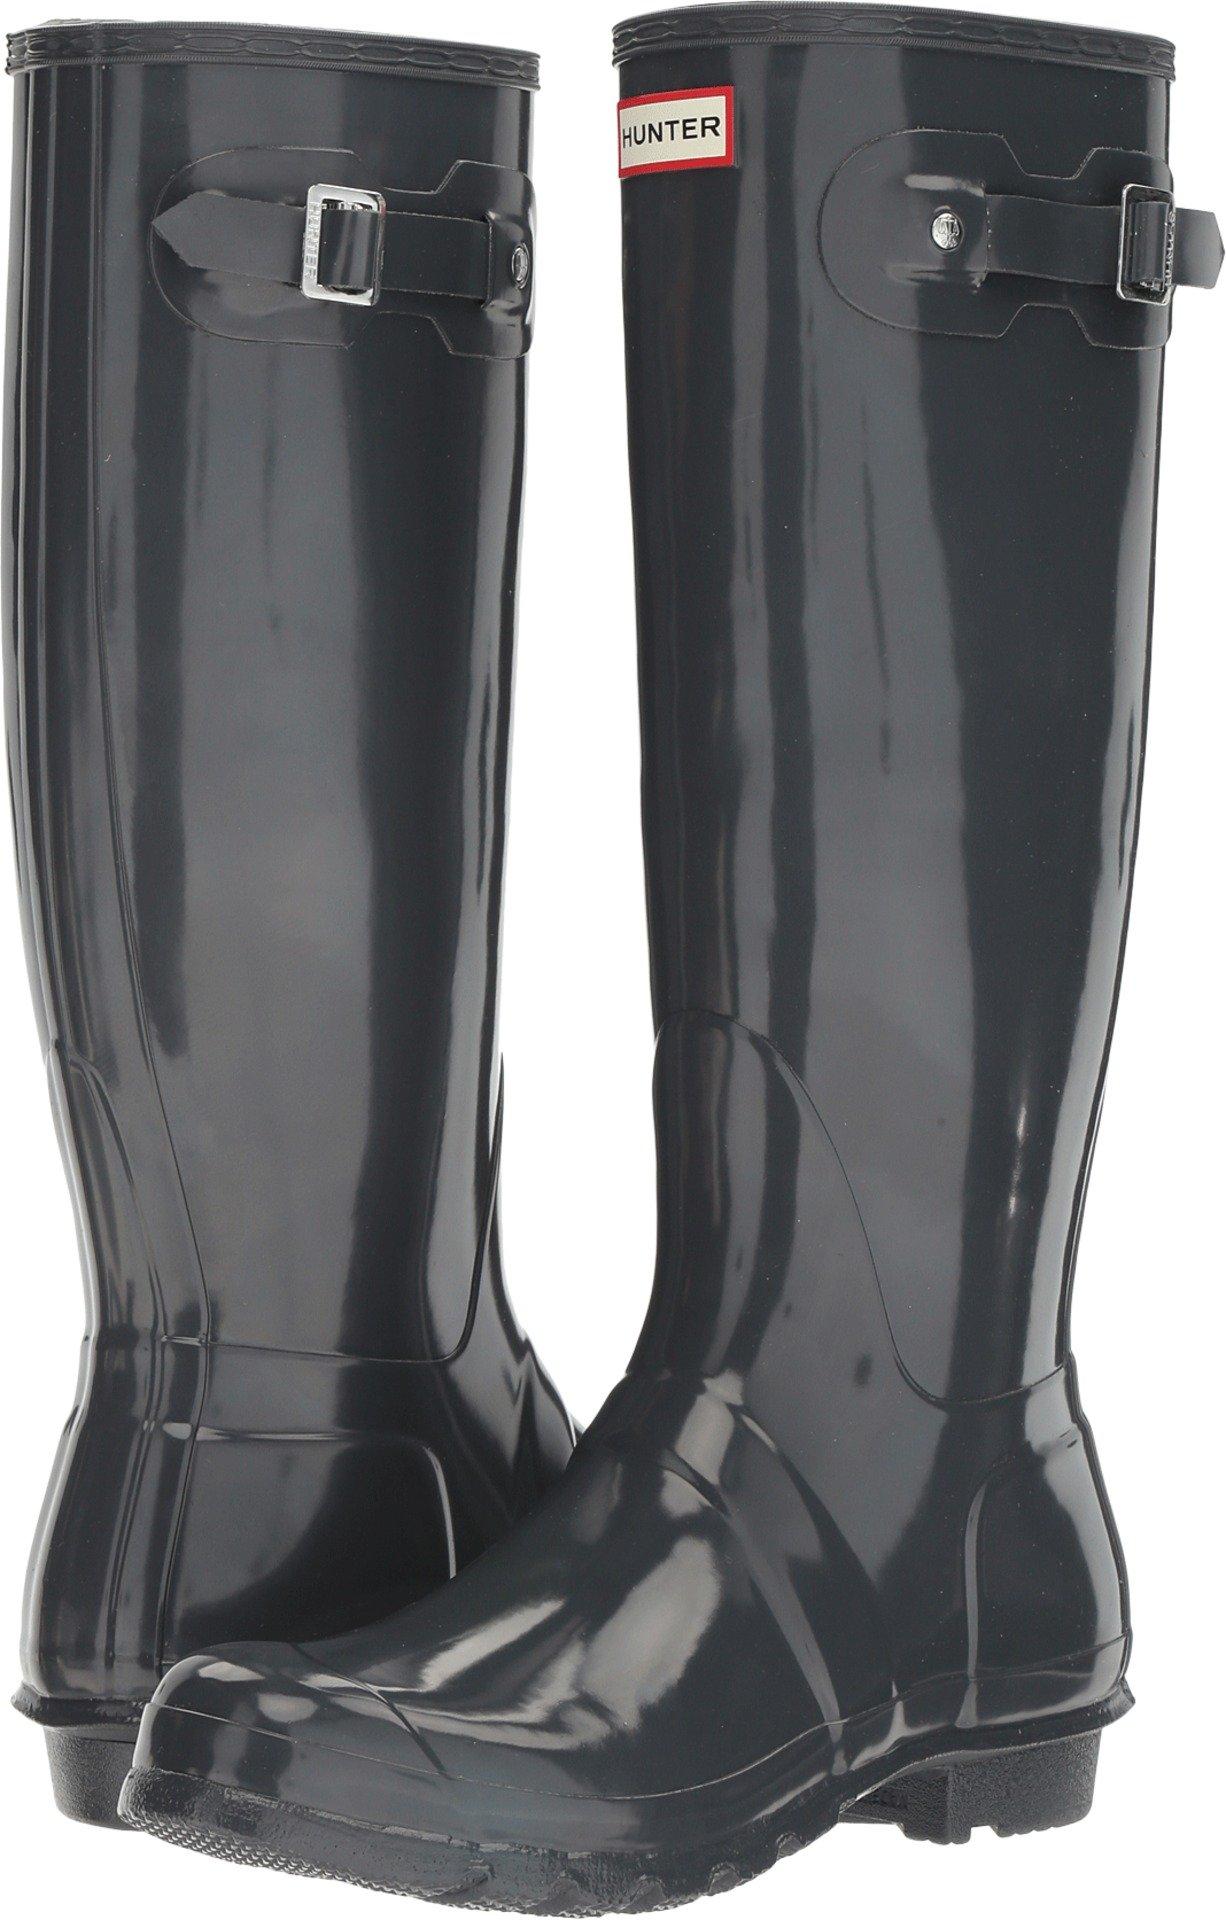 Hunters Boots Original Tall Gloss Rain Boot - Women's Dark Slate, 8.0